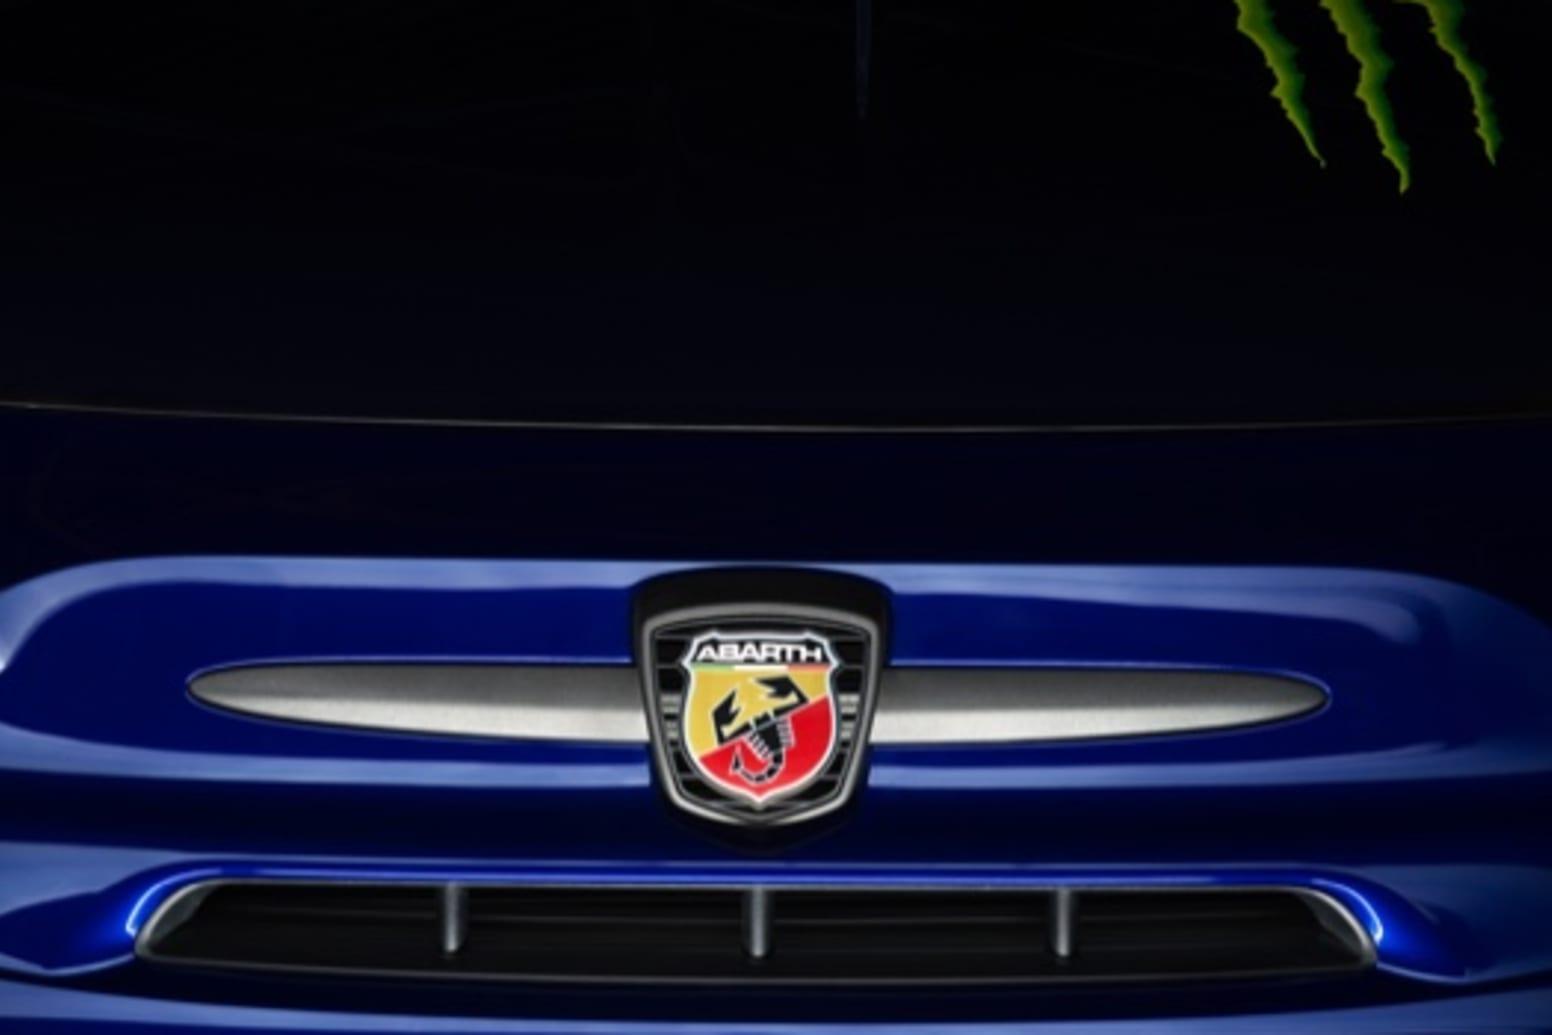 Abarth 595 Monster Energy Yamaha Front Bumper